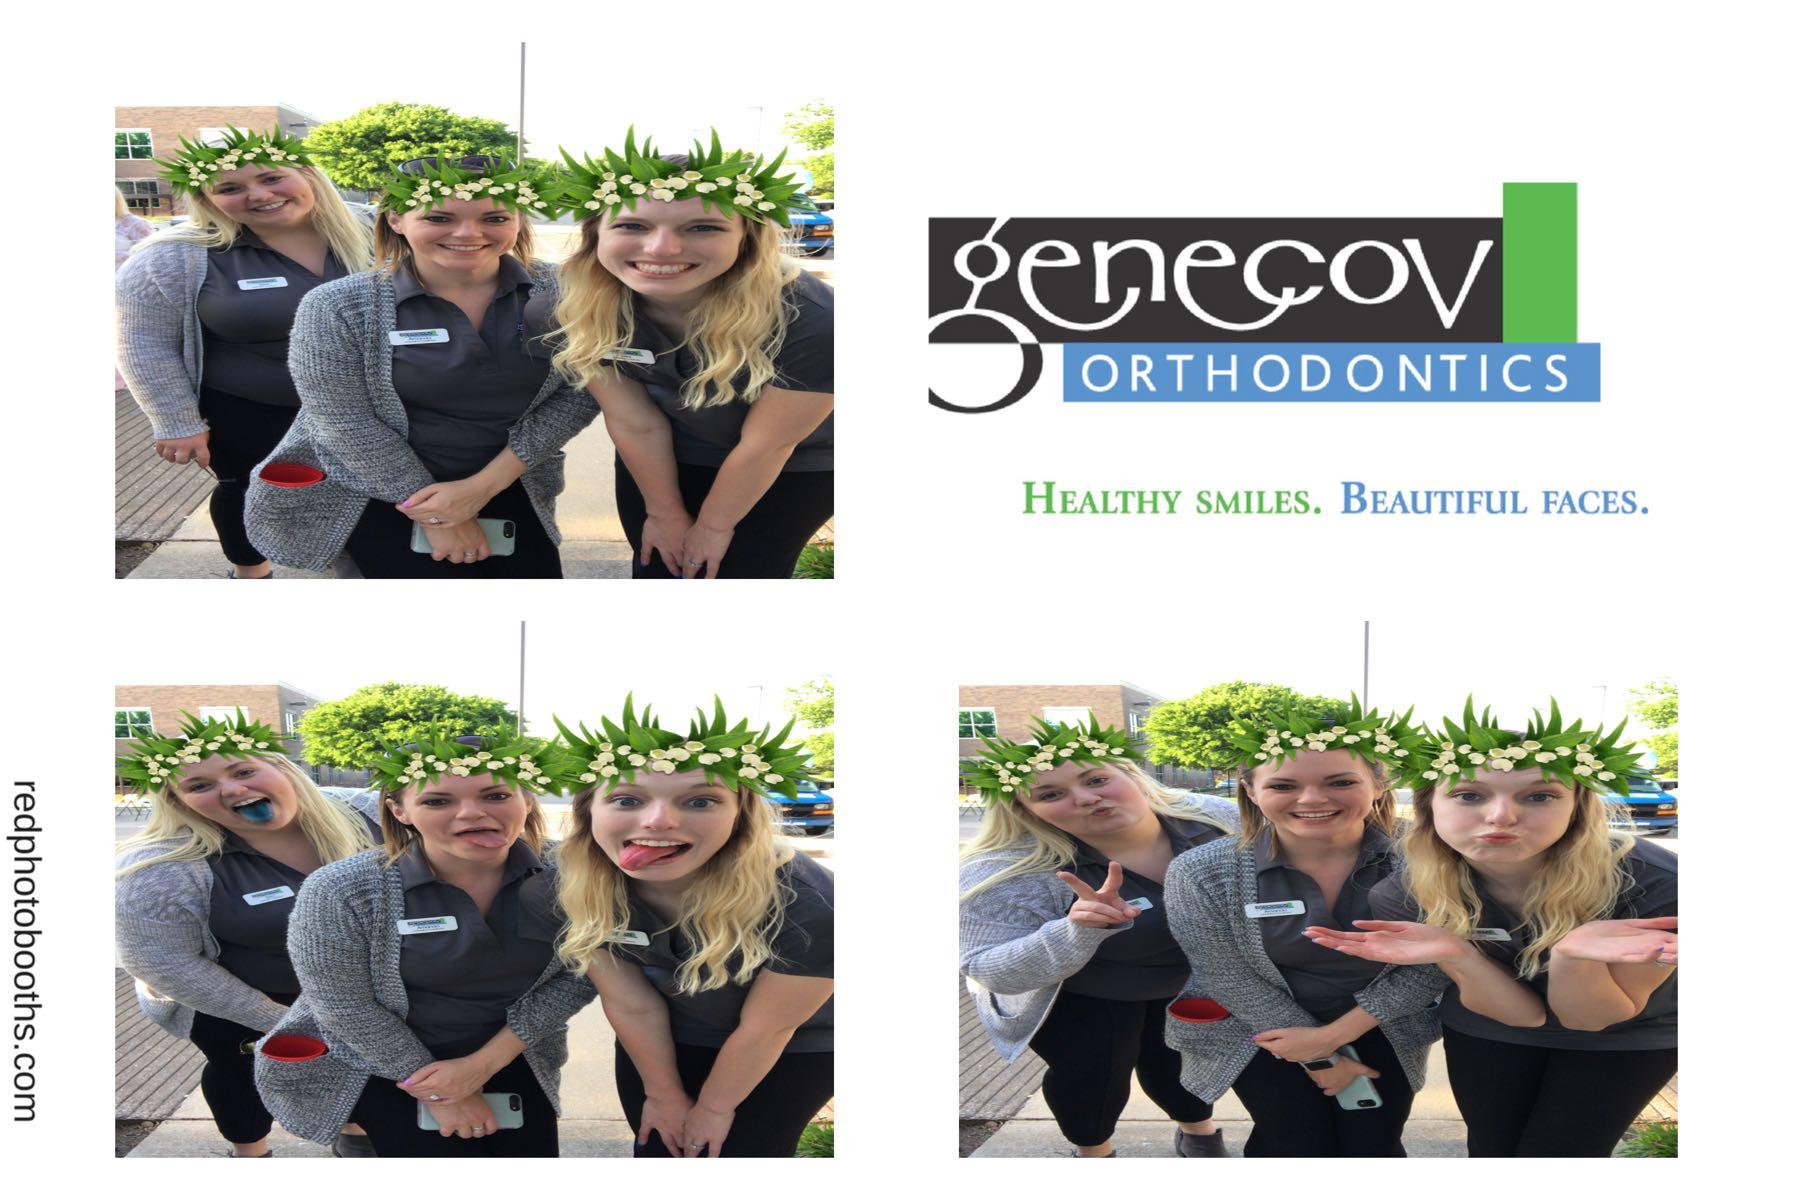 Photo from Genecov Orthodontics